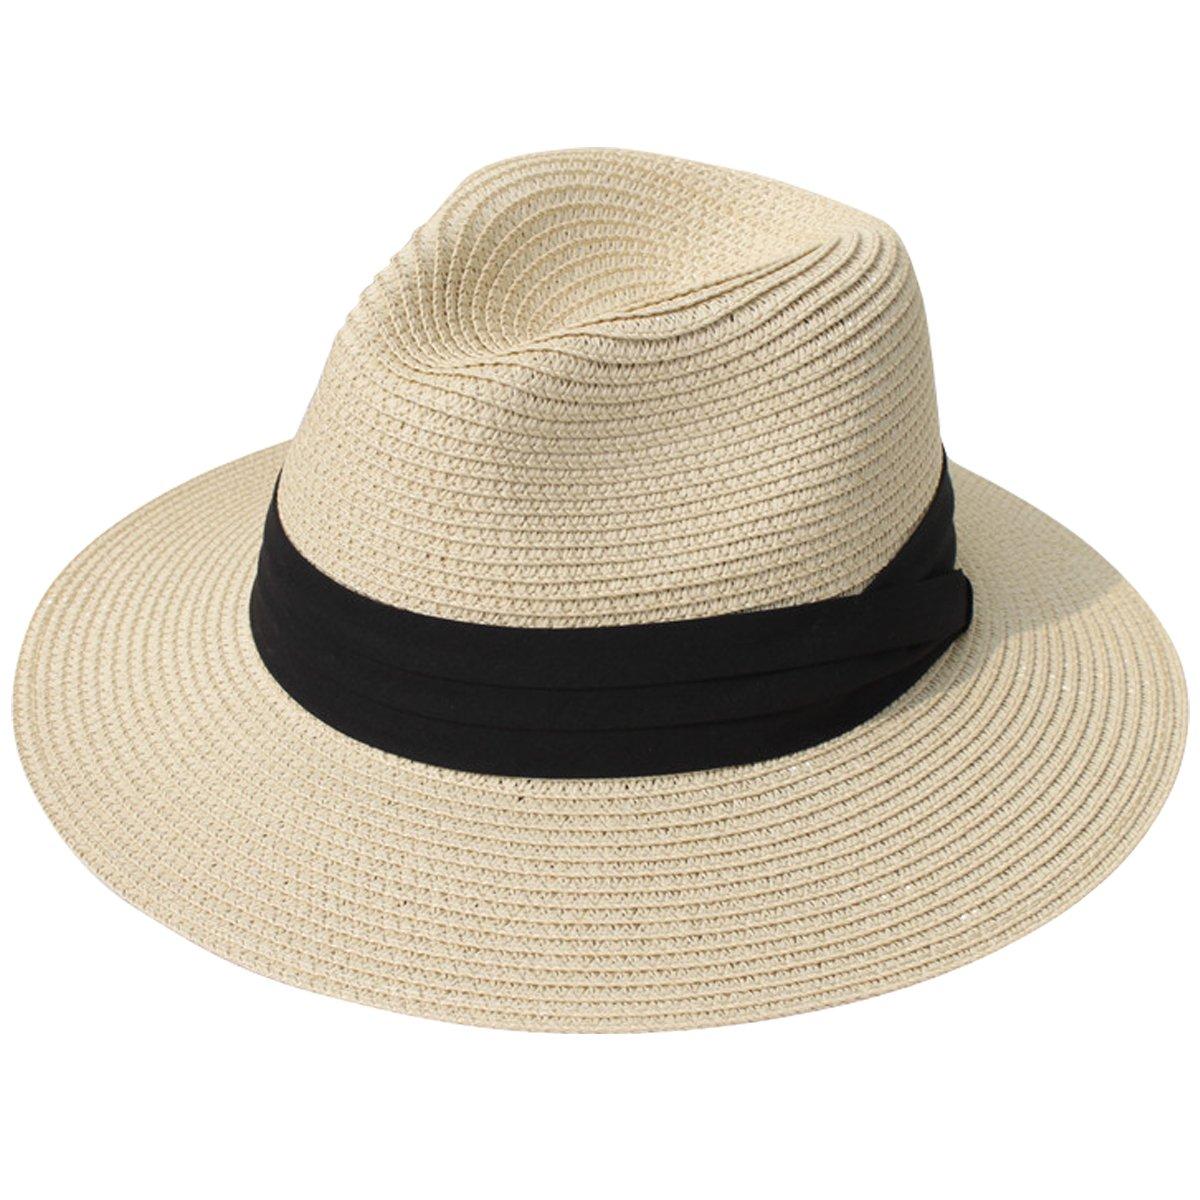 f89435c5 Details about Lanzom Women Wide Brim Straw Panama Roll up Hat Fedora Beach  Sun UPF50+